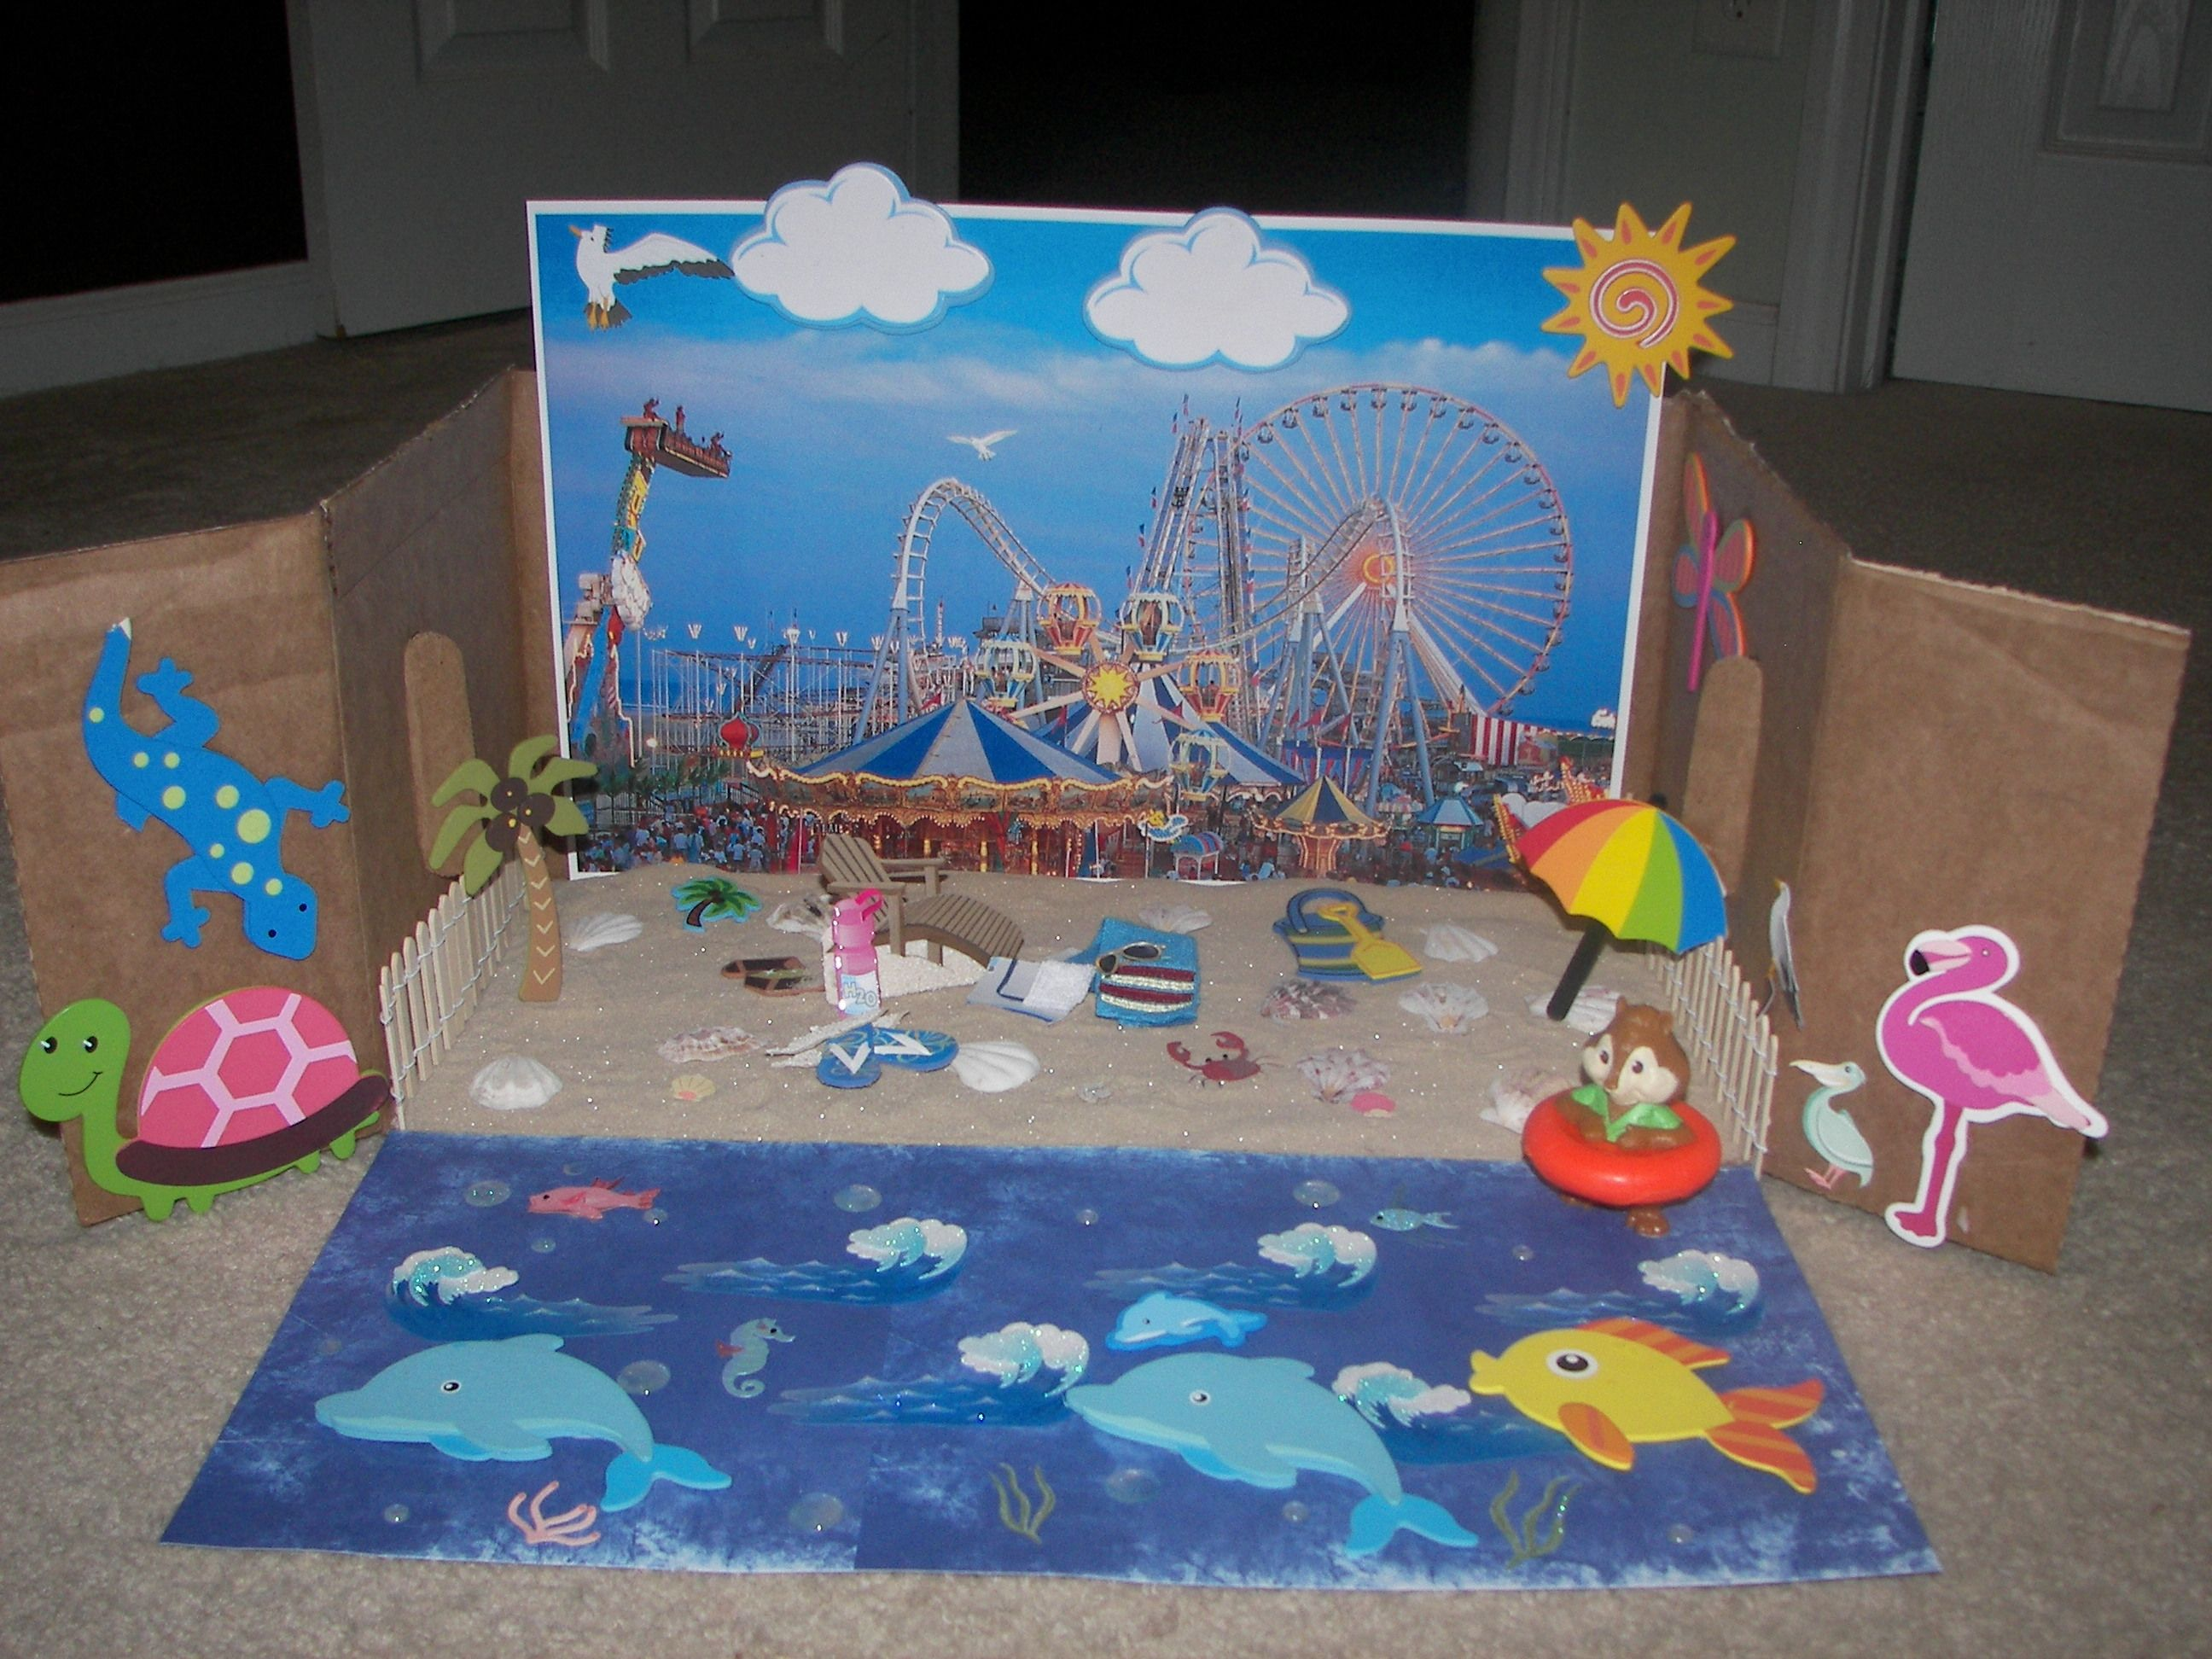 shoe diaper box diorama crafts pinterest dioramas school and teacher. Black Bedroom Furniture Sets. Home Design Ideas